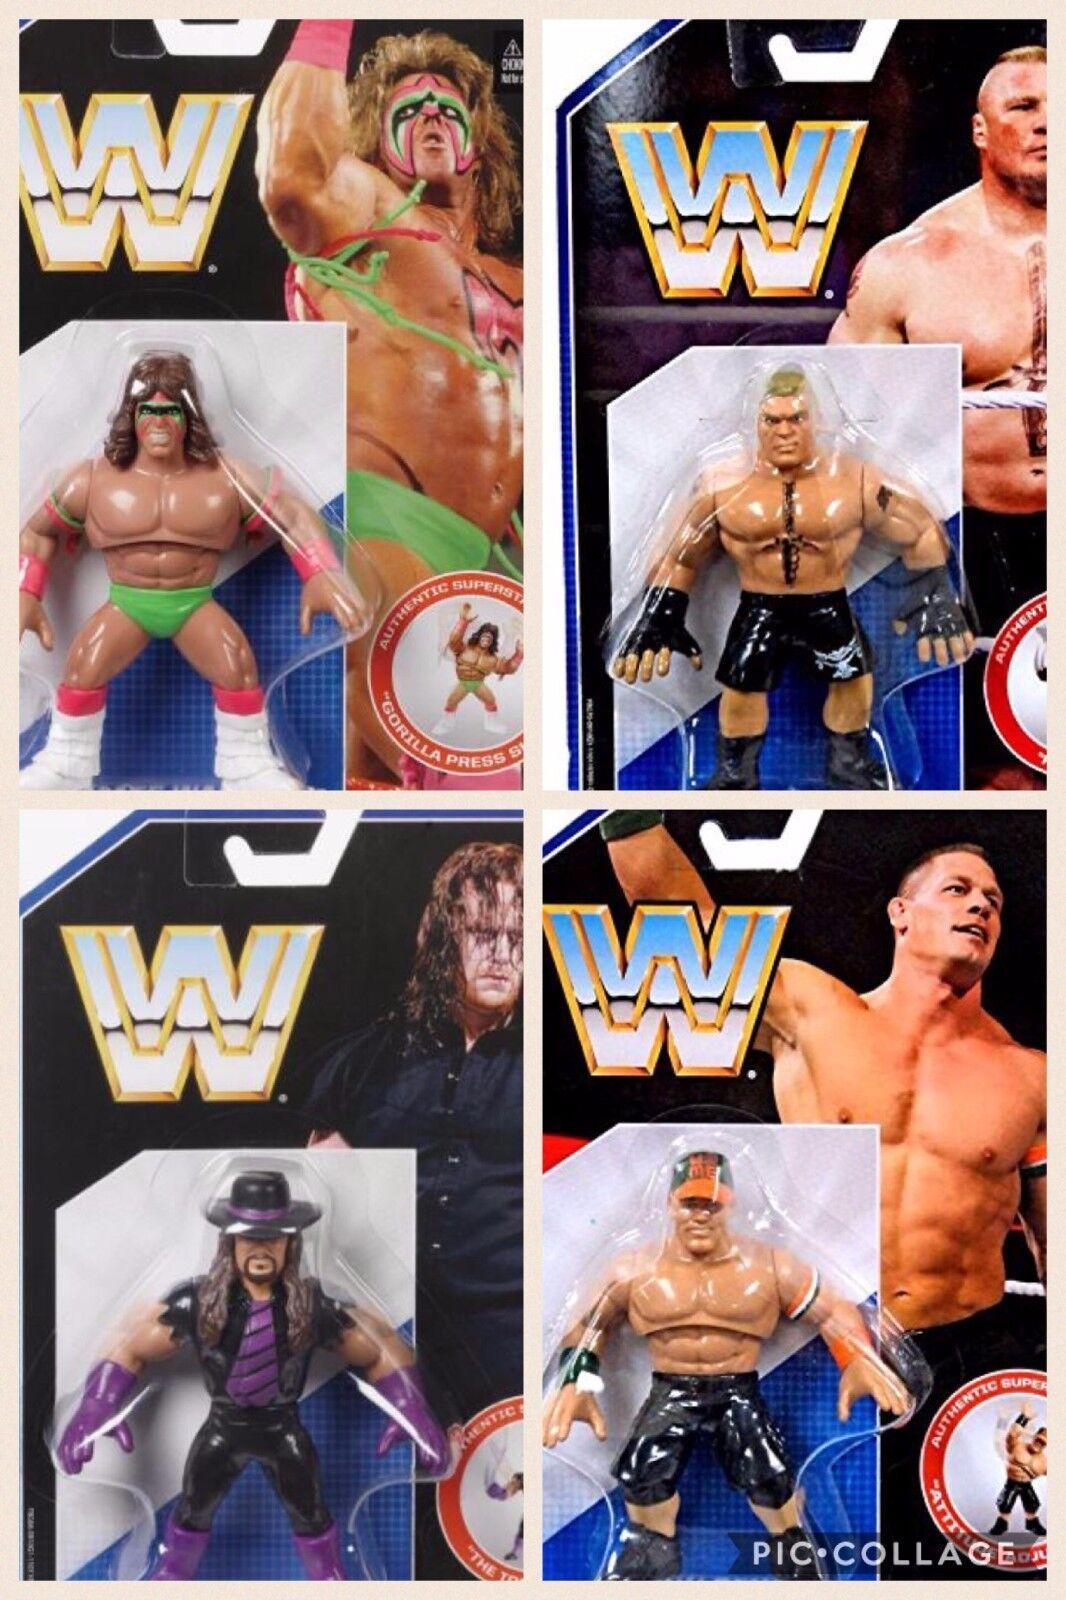 WWE COMPLETE SET BUNDLE RETRO ACTION MATTEL 1 WRESTLING FIGURE HASBRO STYLE WWF